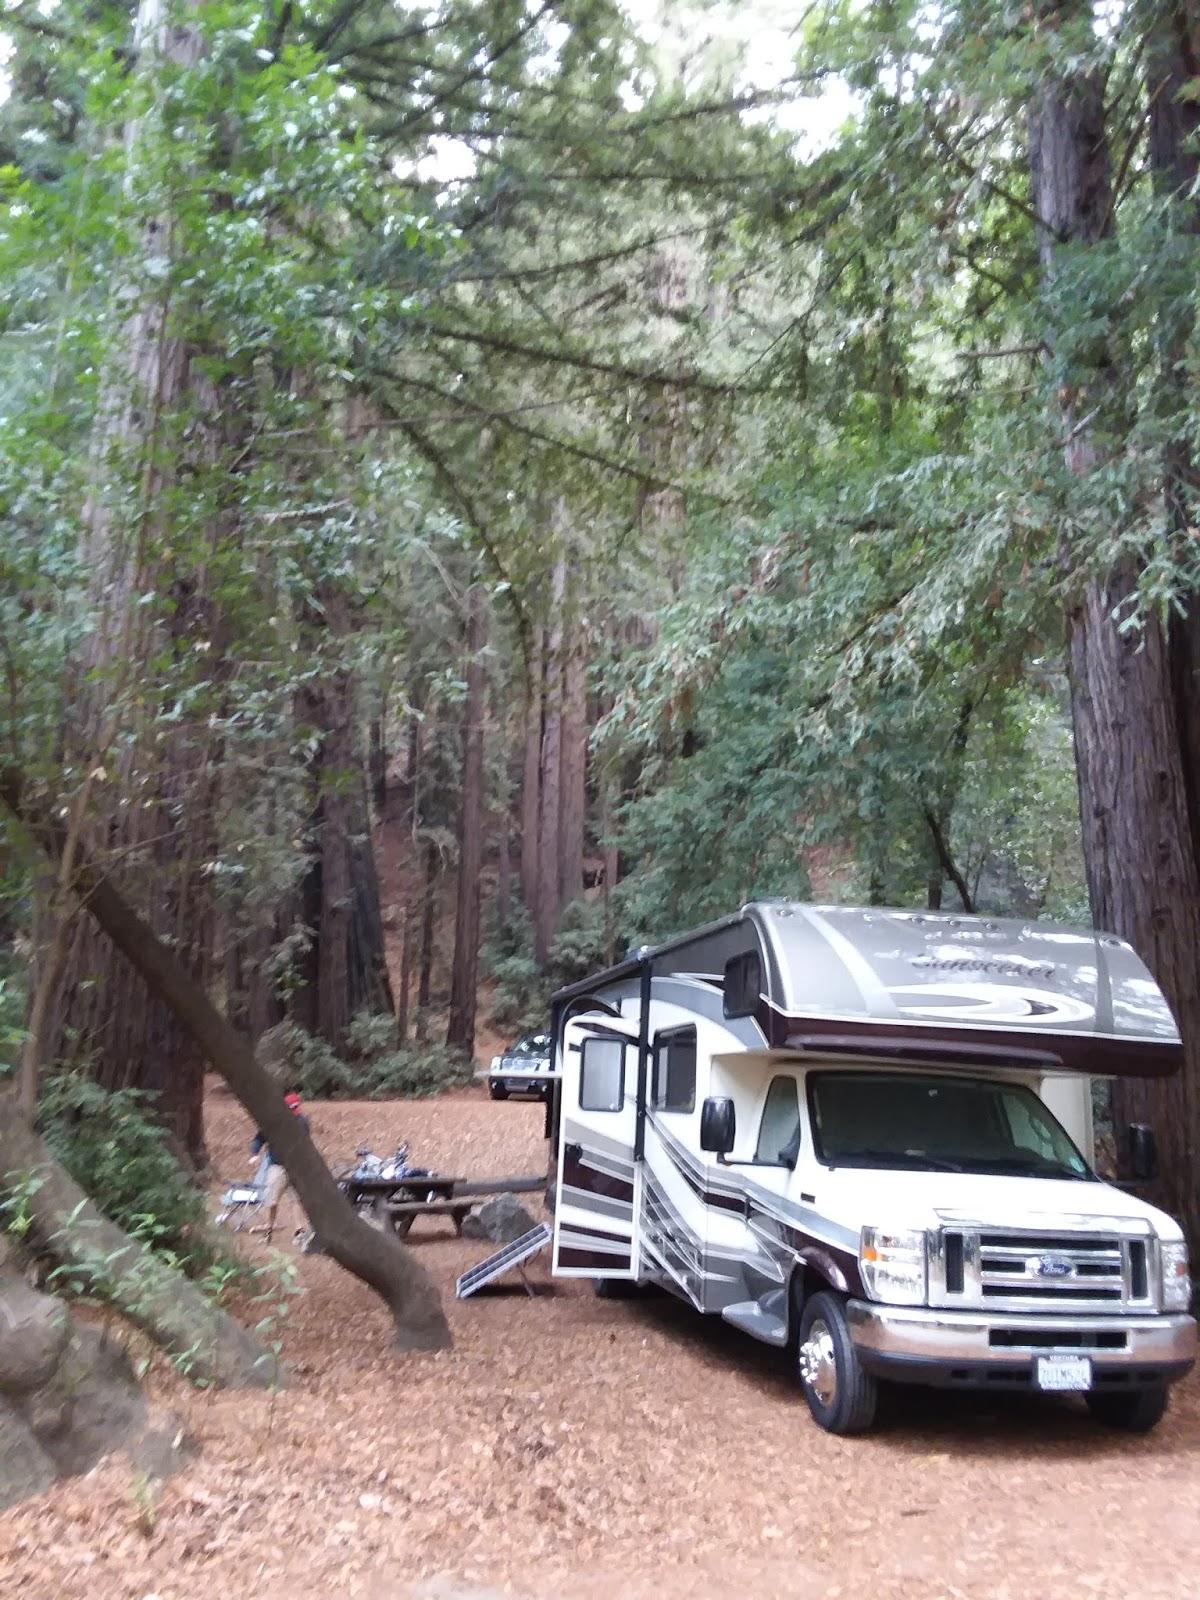 campgroundcrazy: pfeiffer big sur state park, big sur, california